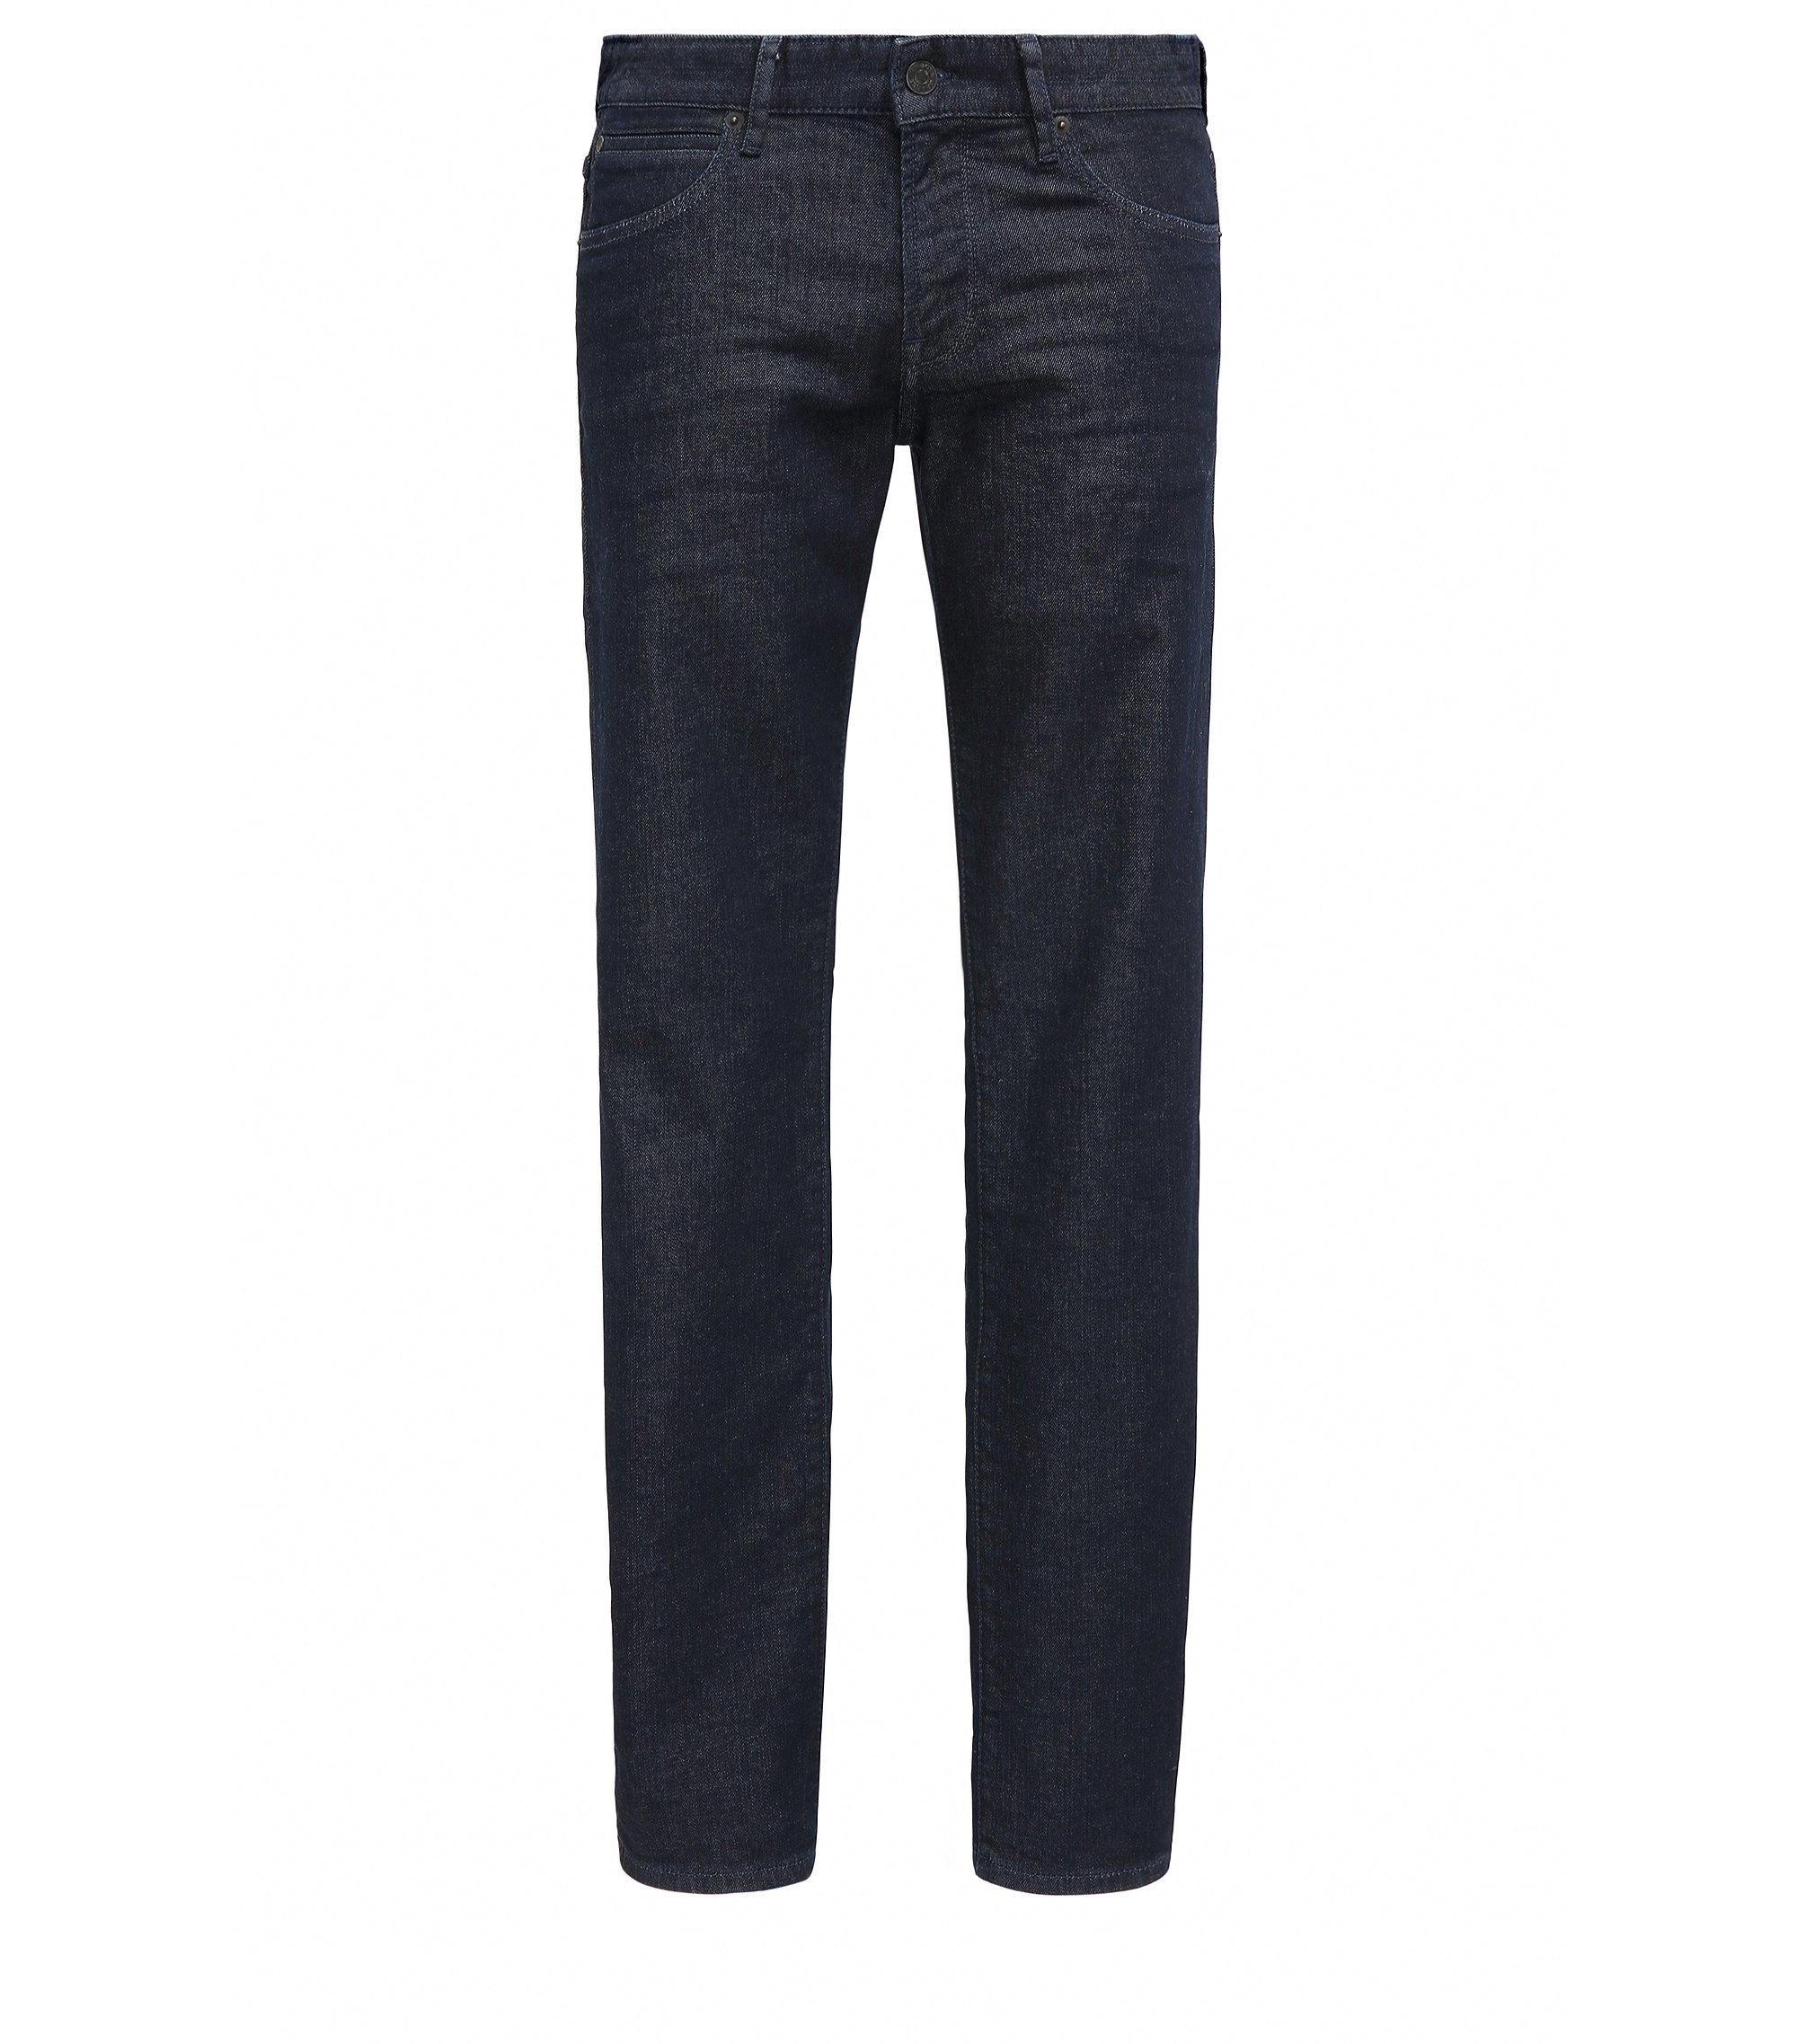 Jeans Regular Fit en denim stretch, Bleu foncé